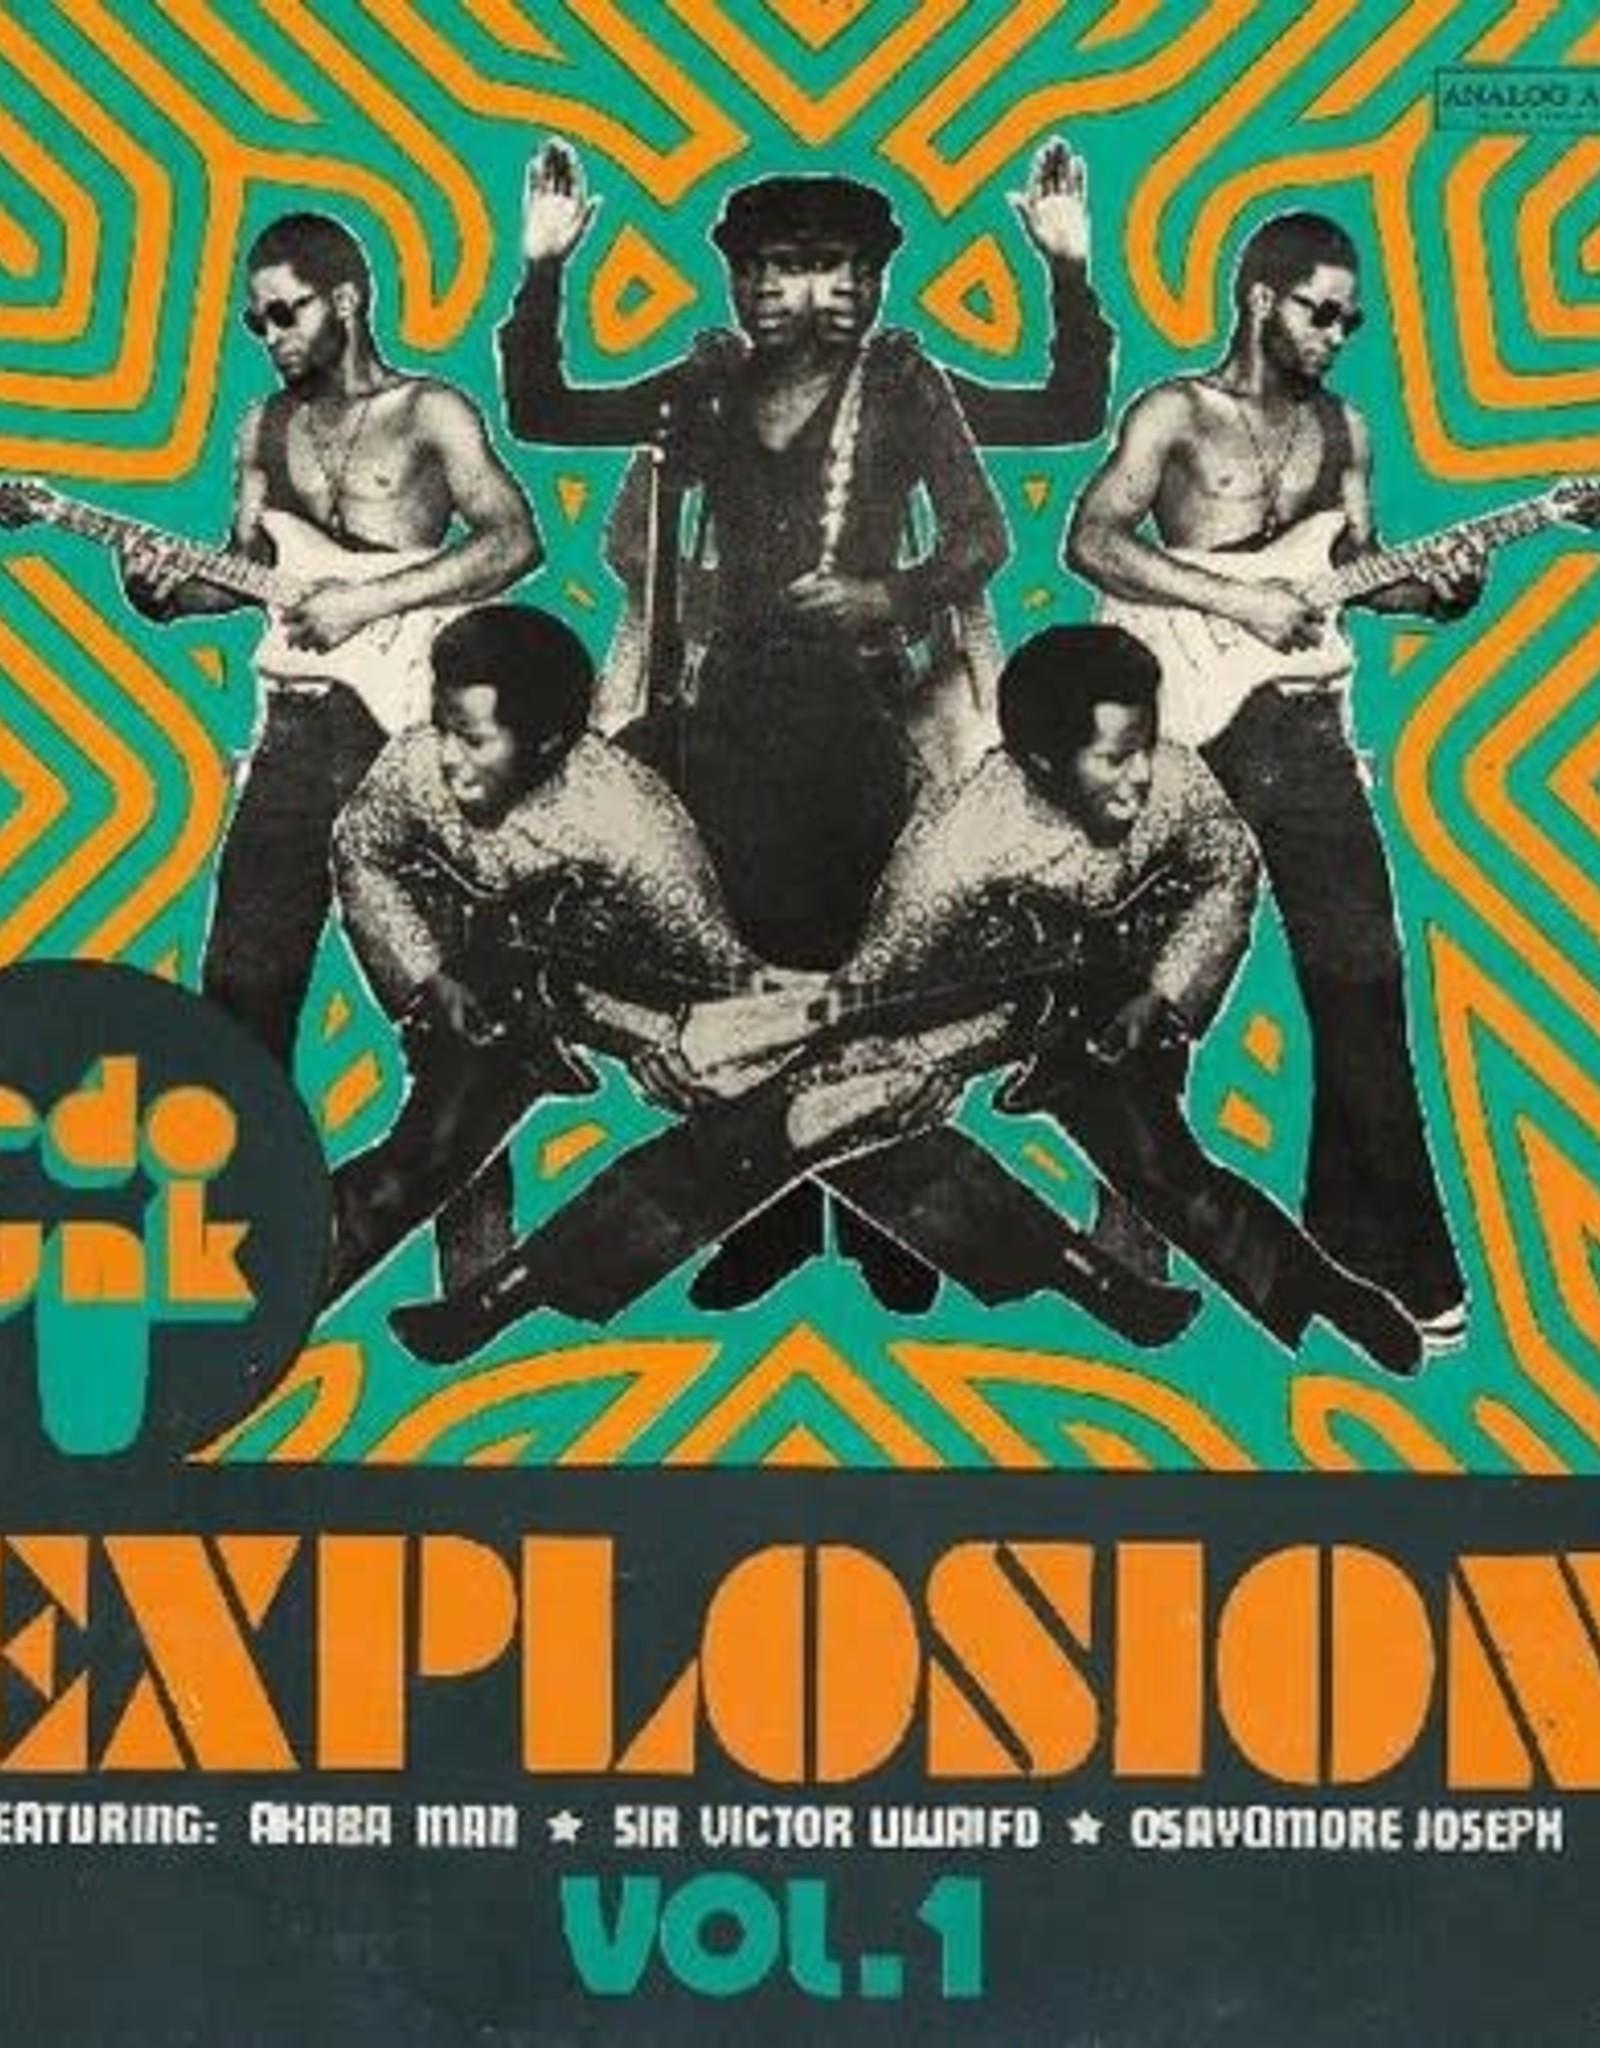 Edo Funk Explosion Vol. 1 - Various Artists